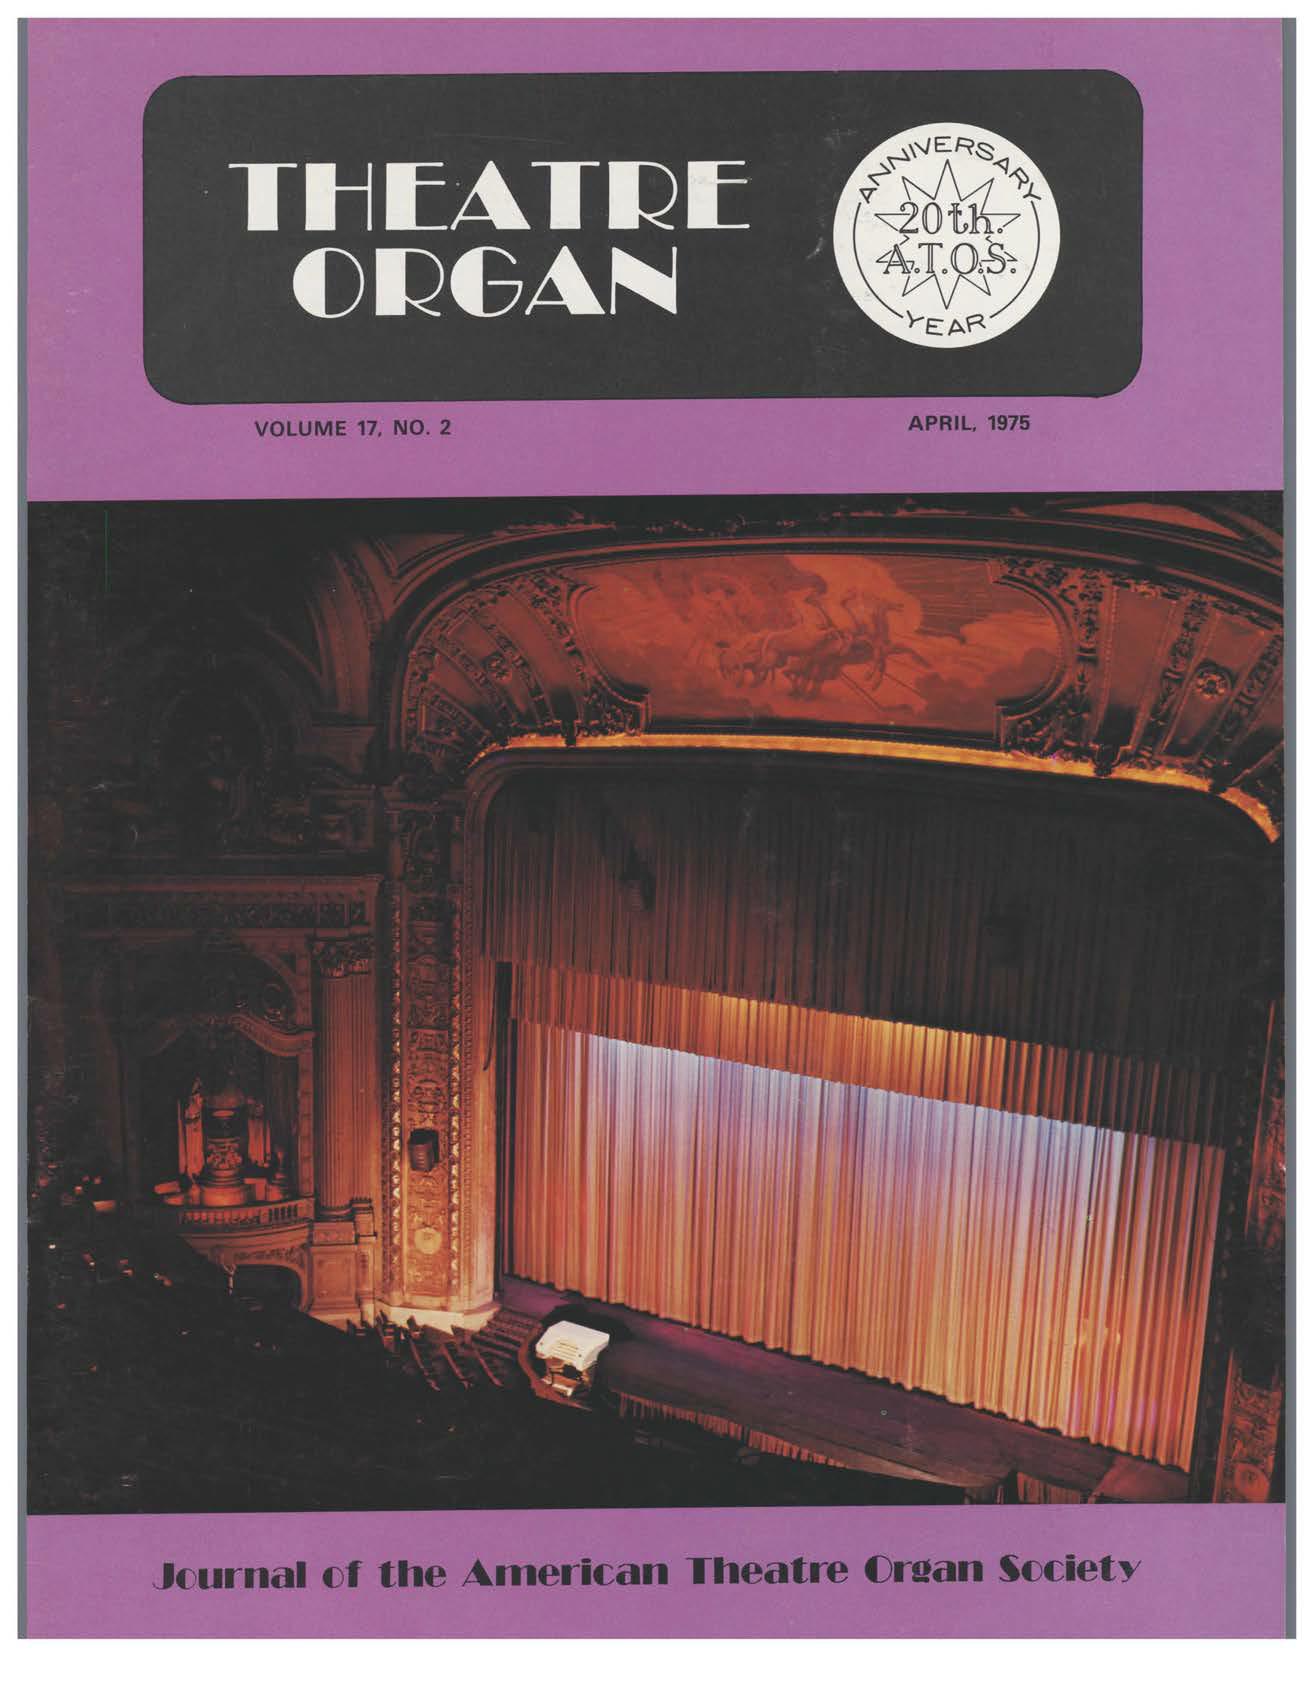 Theatre Organ, April 1975, Volume 17, Number 2